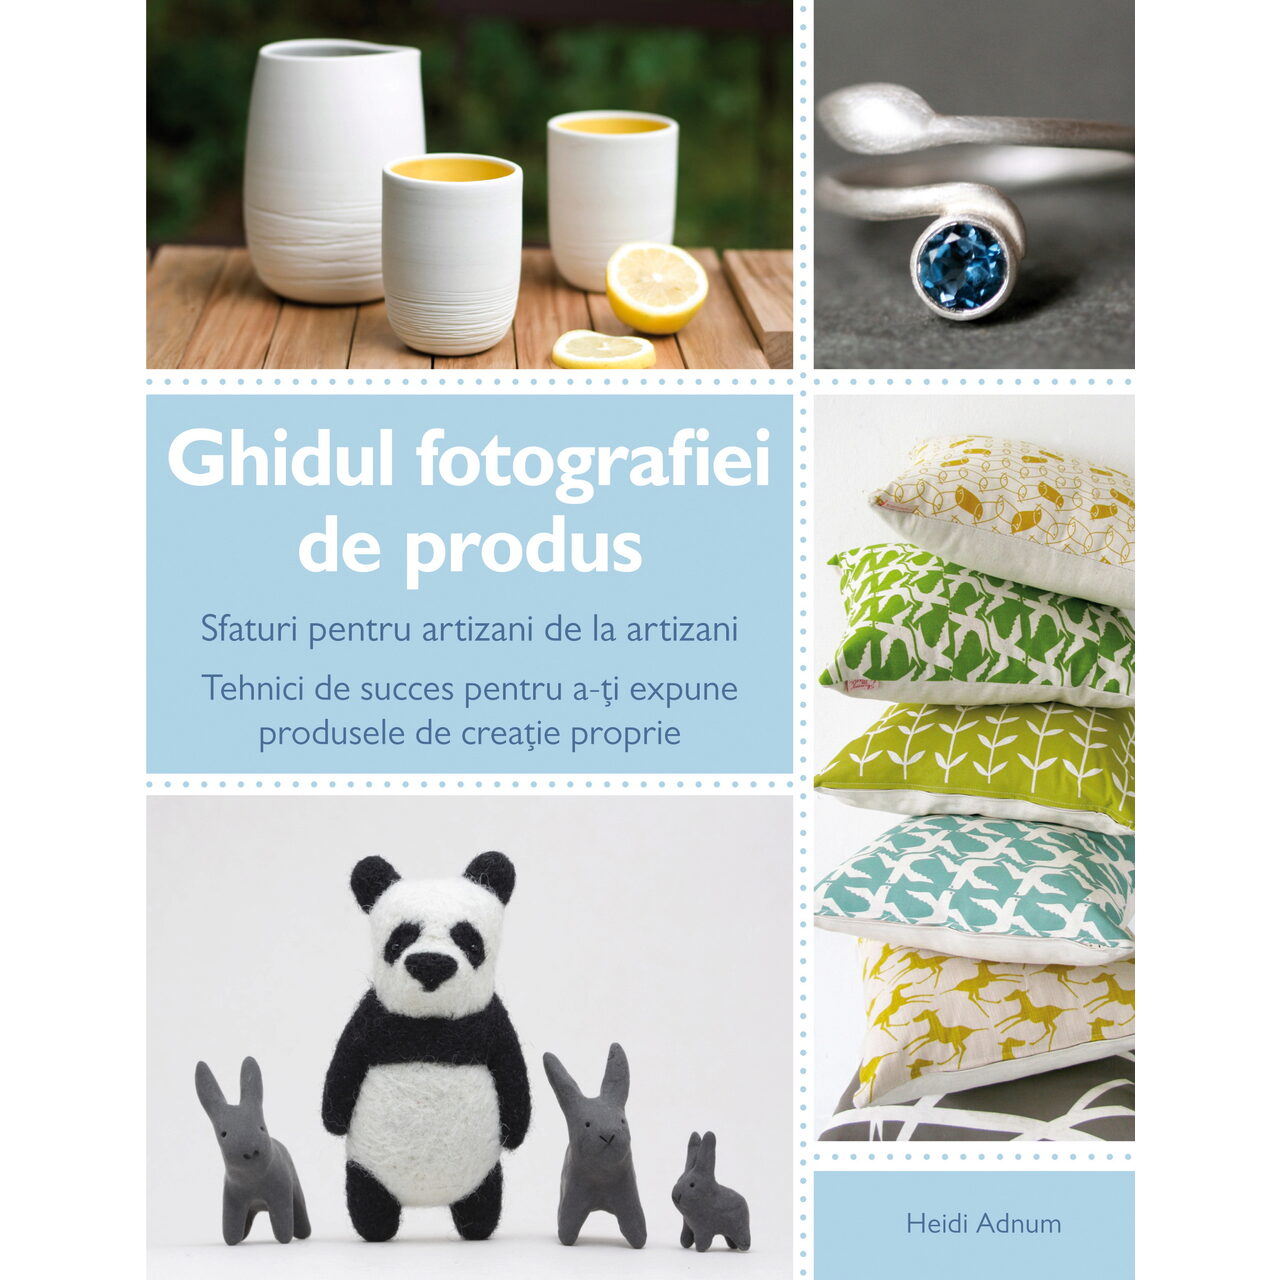 Ghidul fotografiei de produs imagine edituracasa.ro